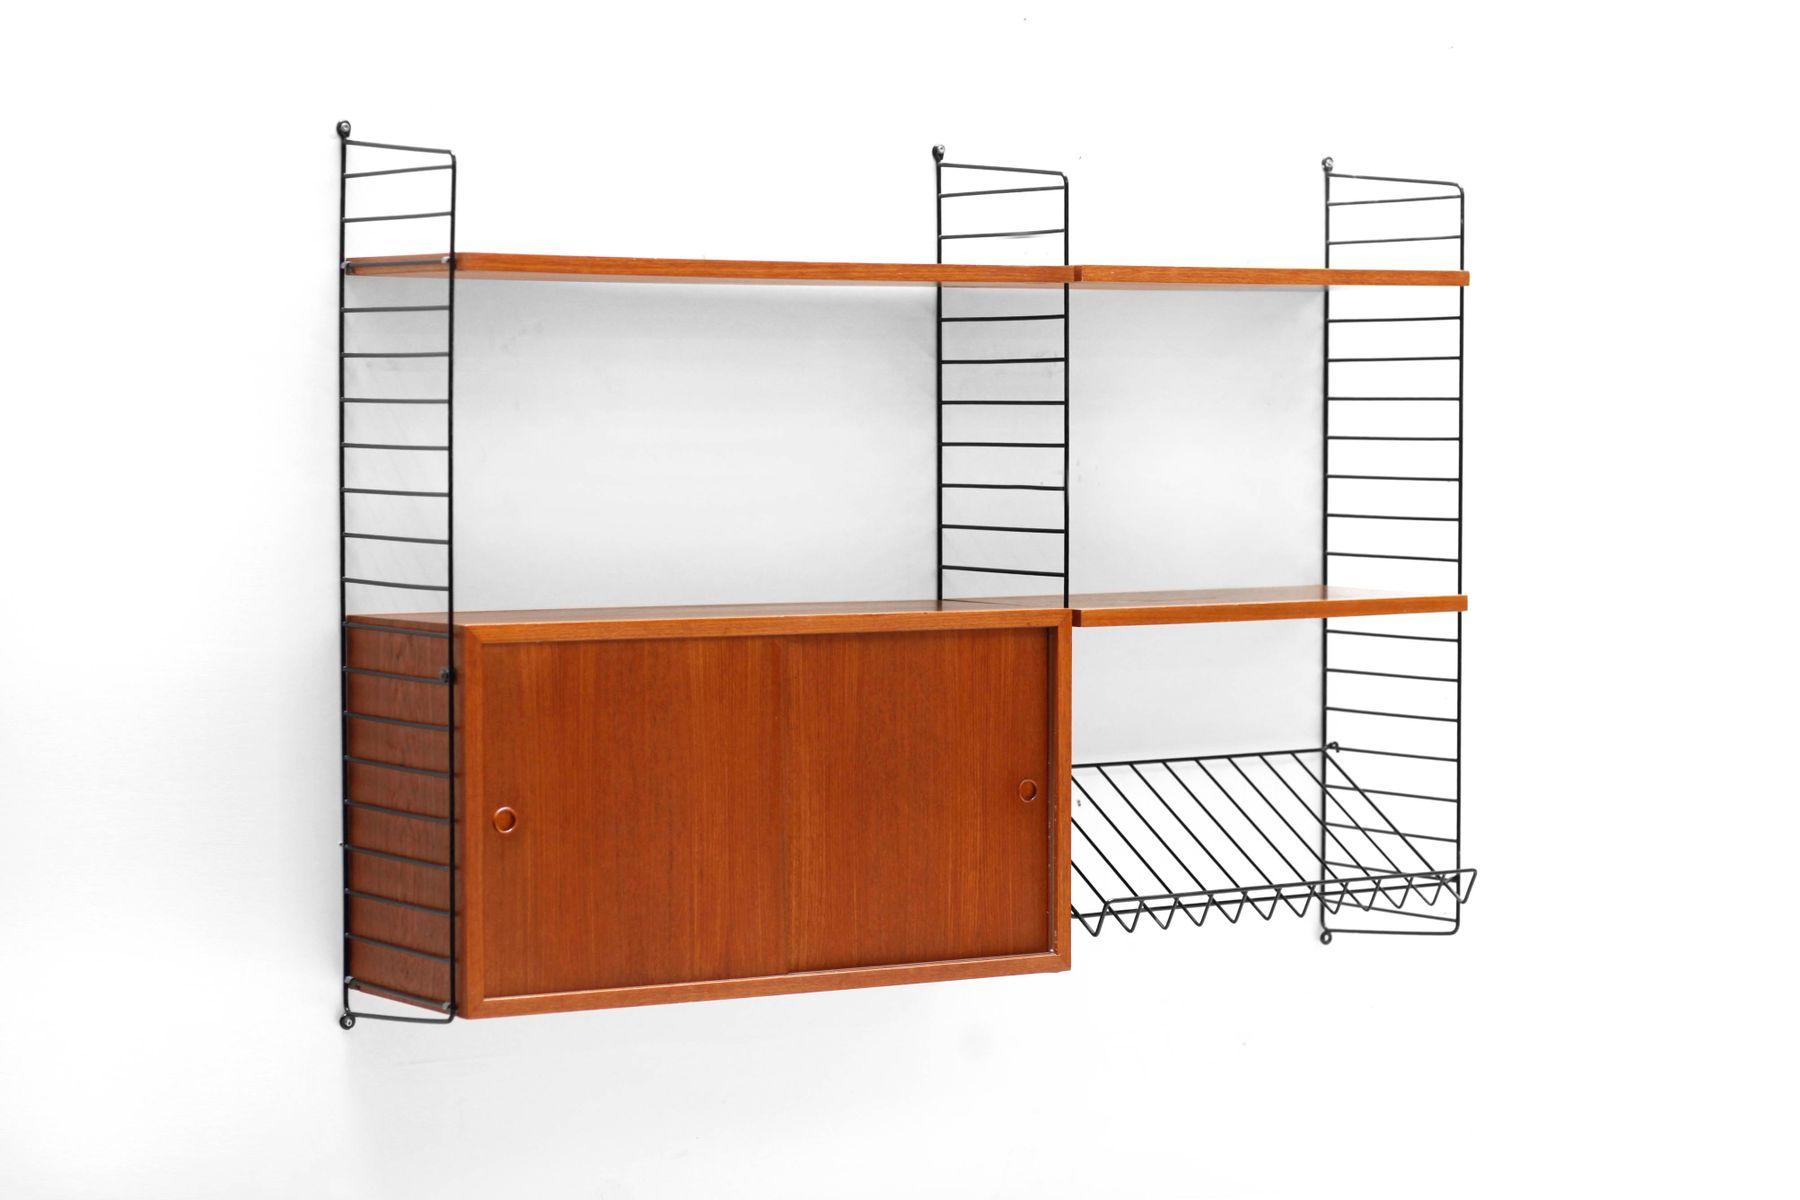 Nisse Strinning teak wall unit from kajsa nisse strinning for string 1960s for